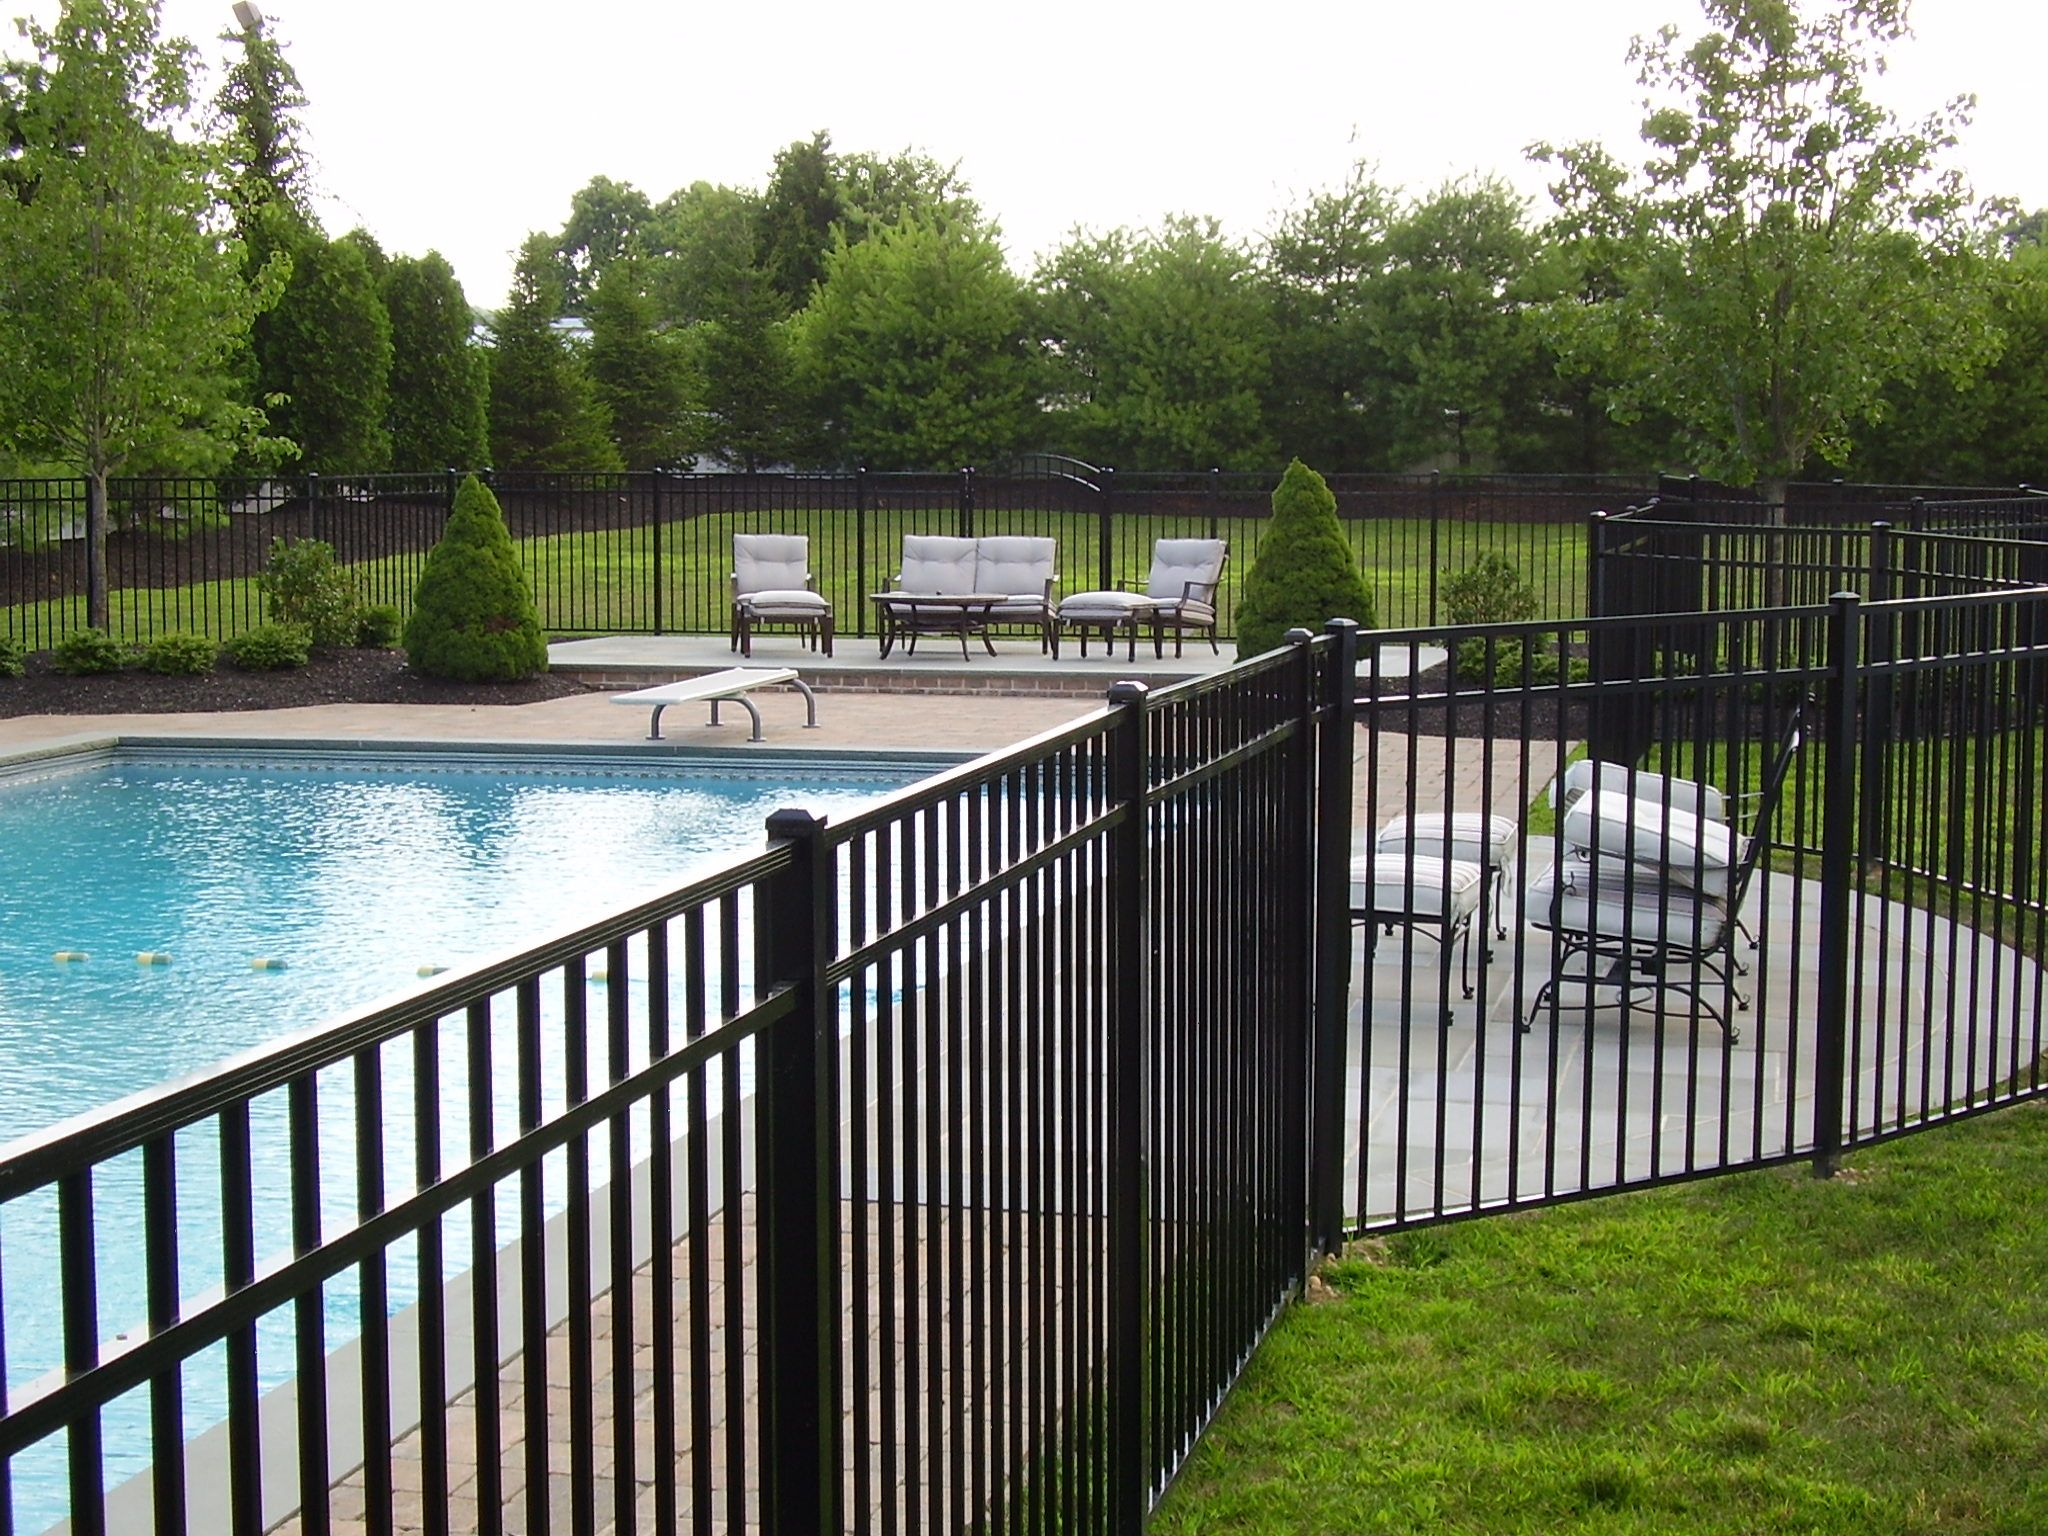 5 Opal Style Aluminum Pool Fence Aluminum Pool Fence Pool Fence Safe Swimming Pool